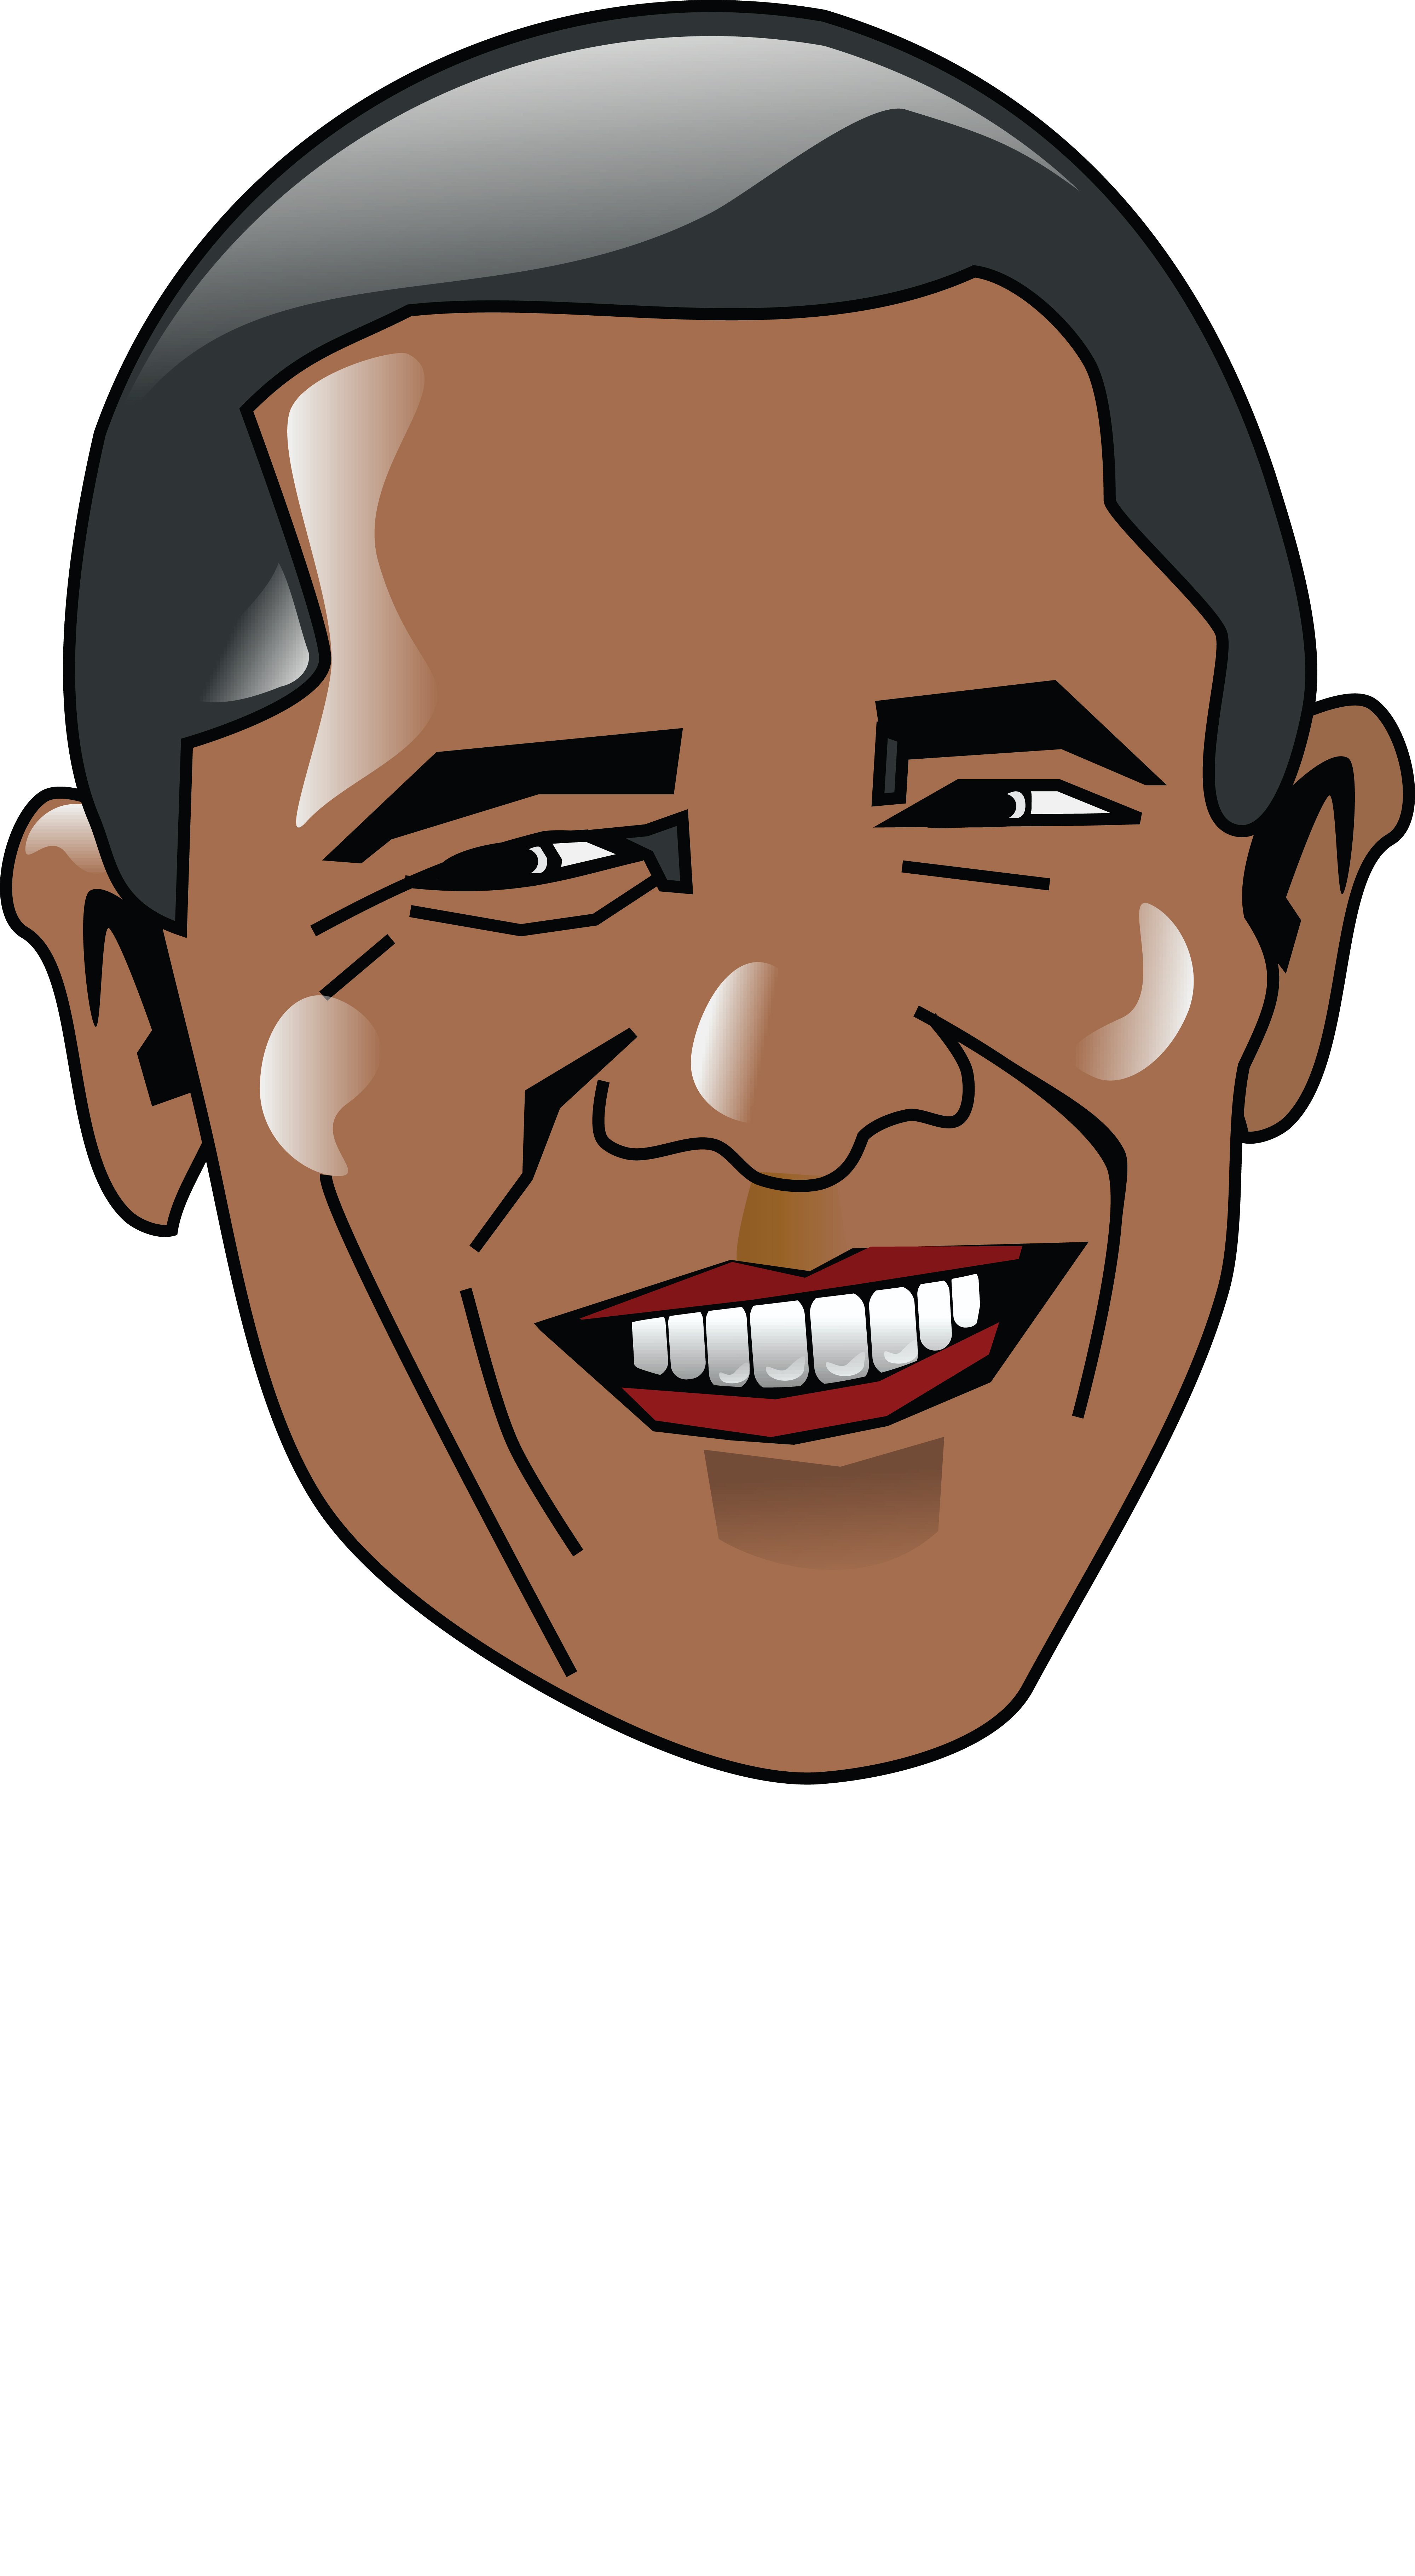 Free Clipart Of Barack Obama #0001682 .